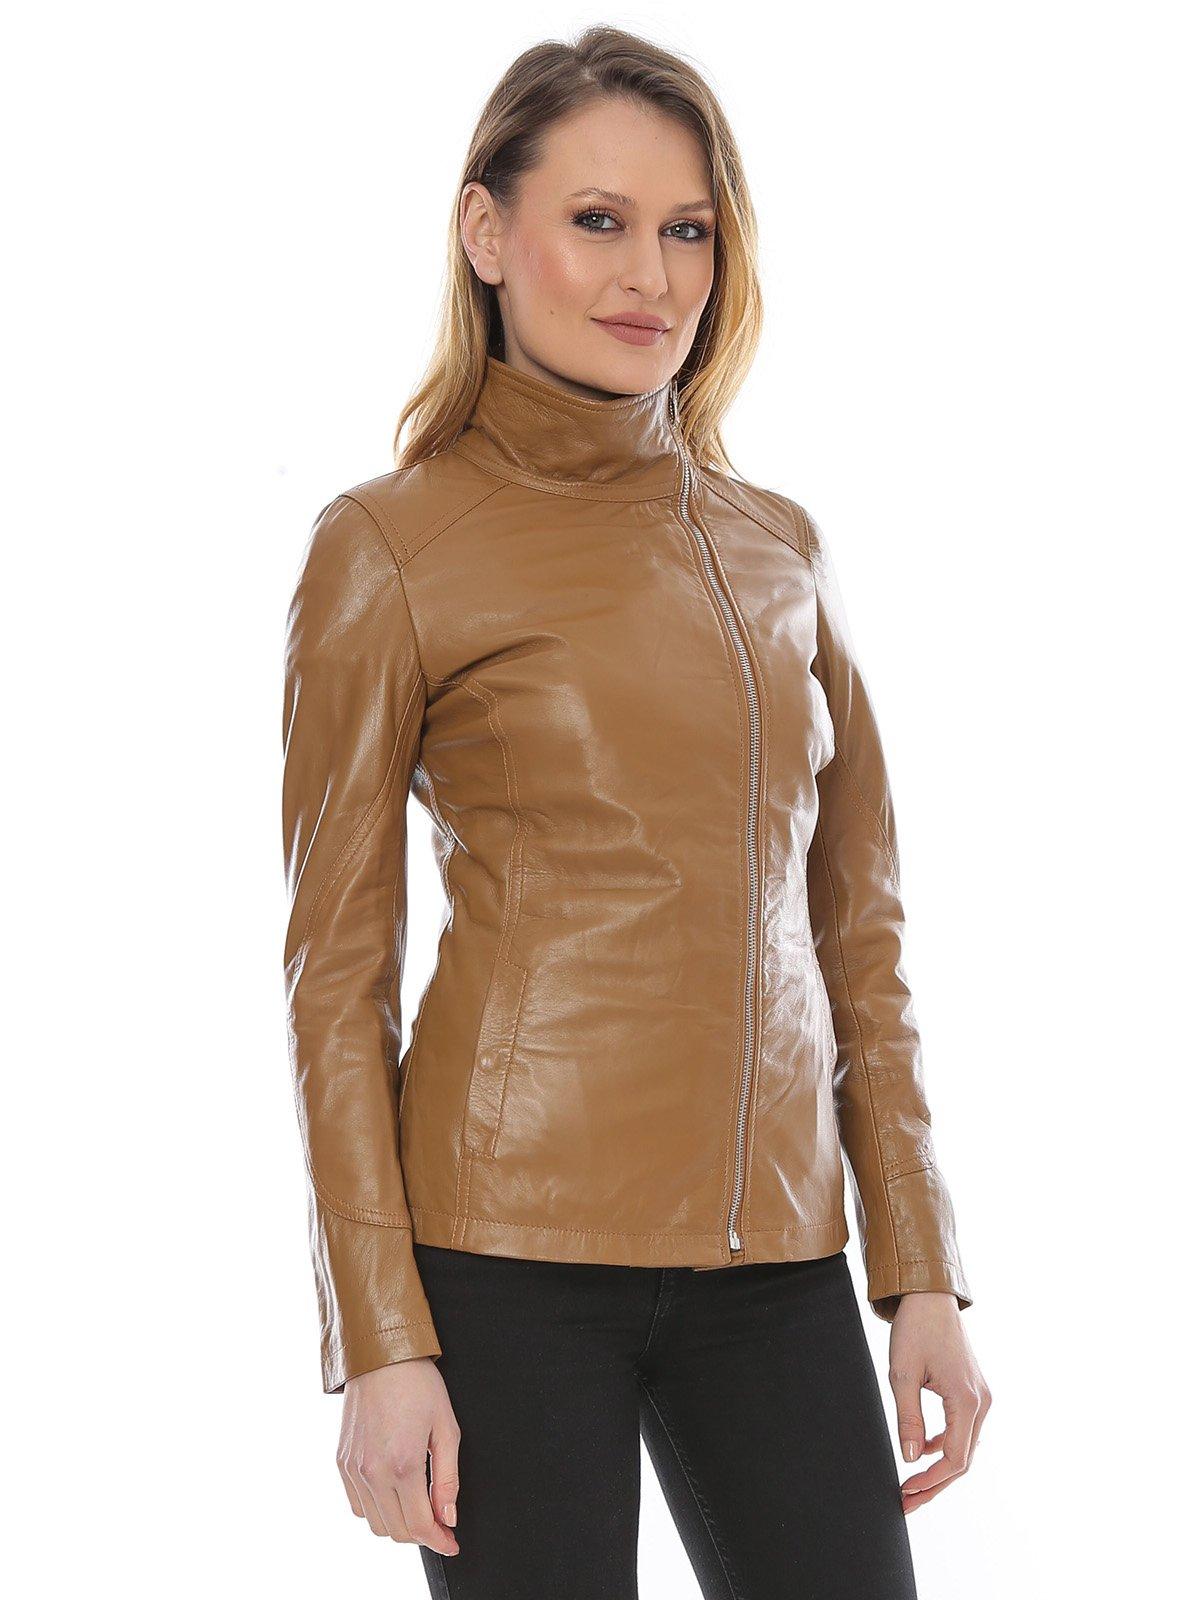 Куртка коньячного цвета | 3010592 | фото 3